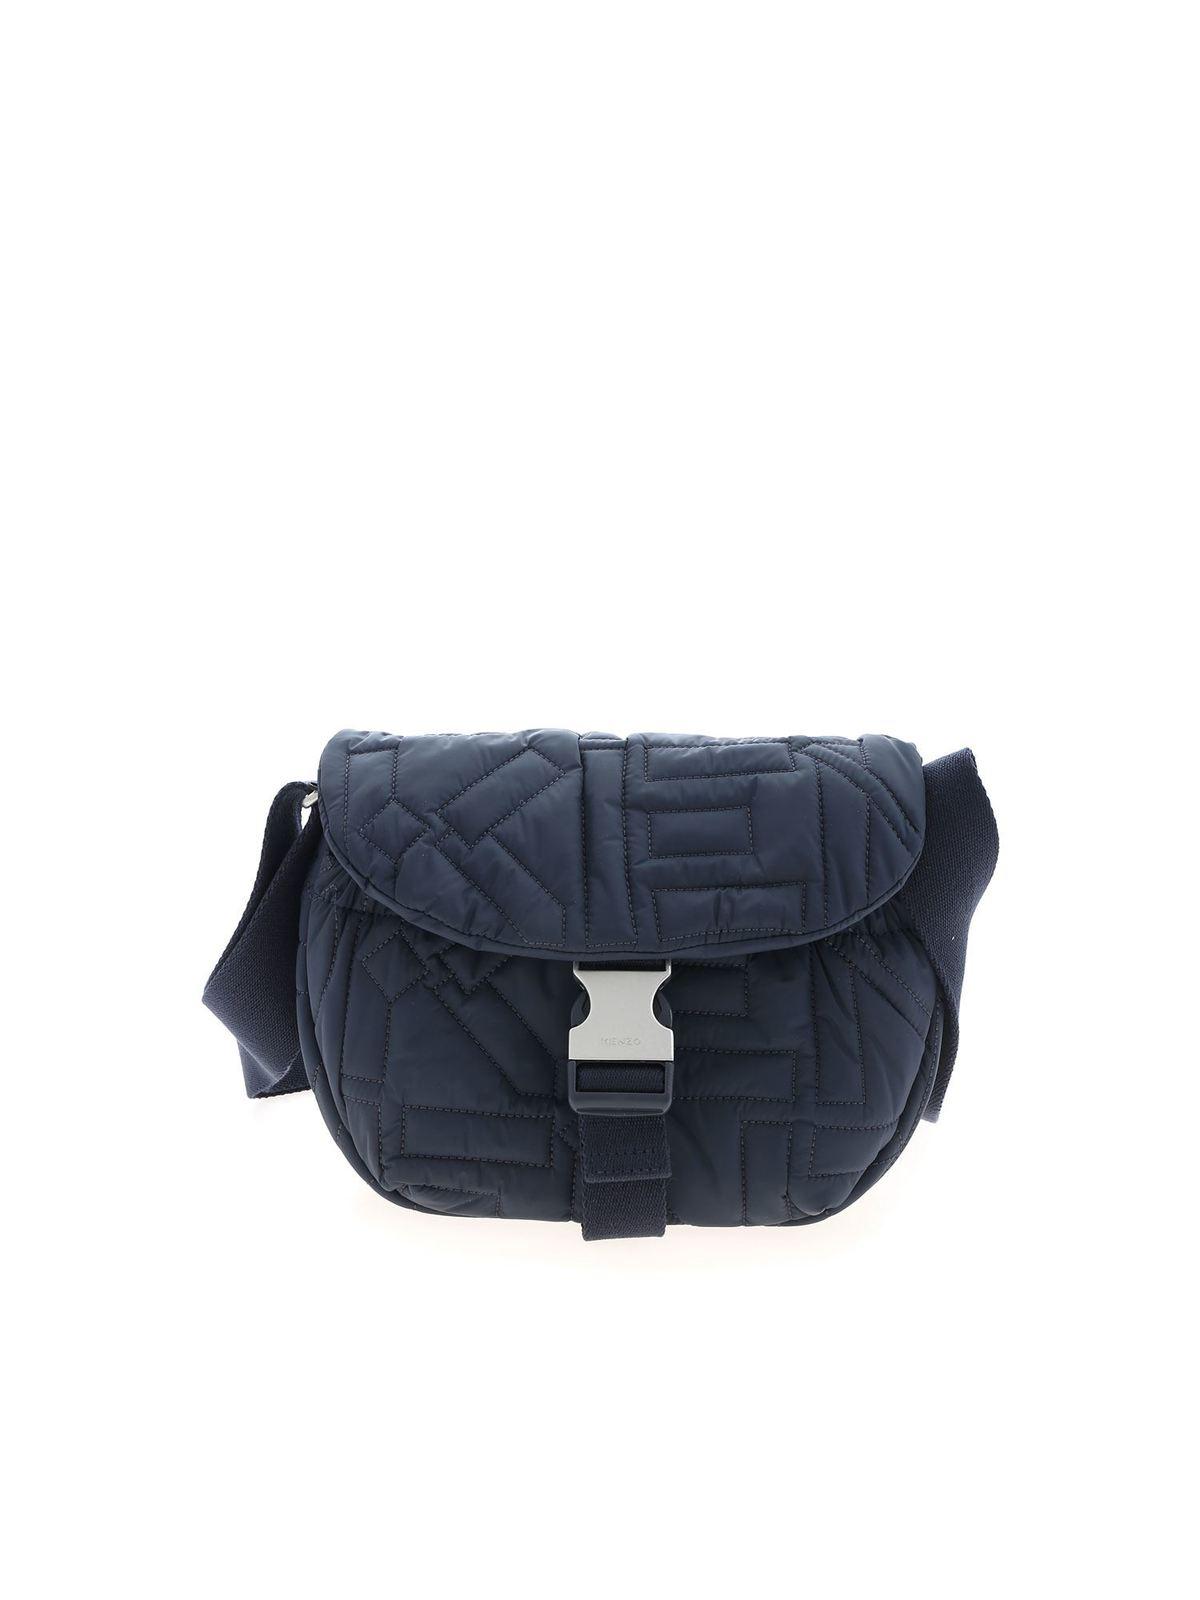 KENZO SMALL ARCTIK SHOULDER BAG IN BLUE